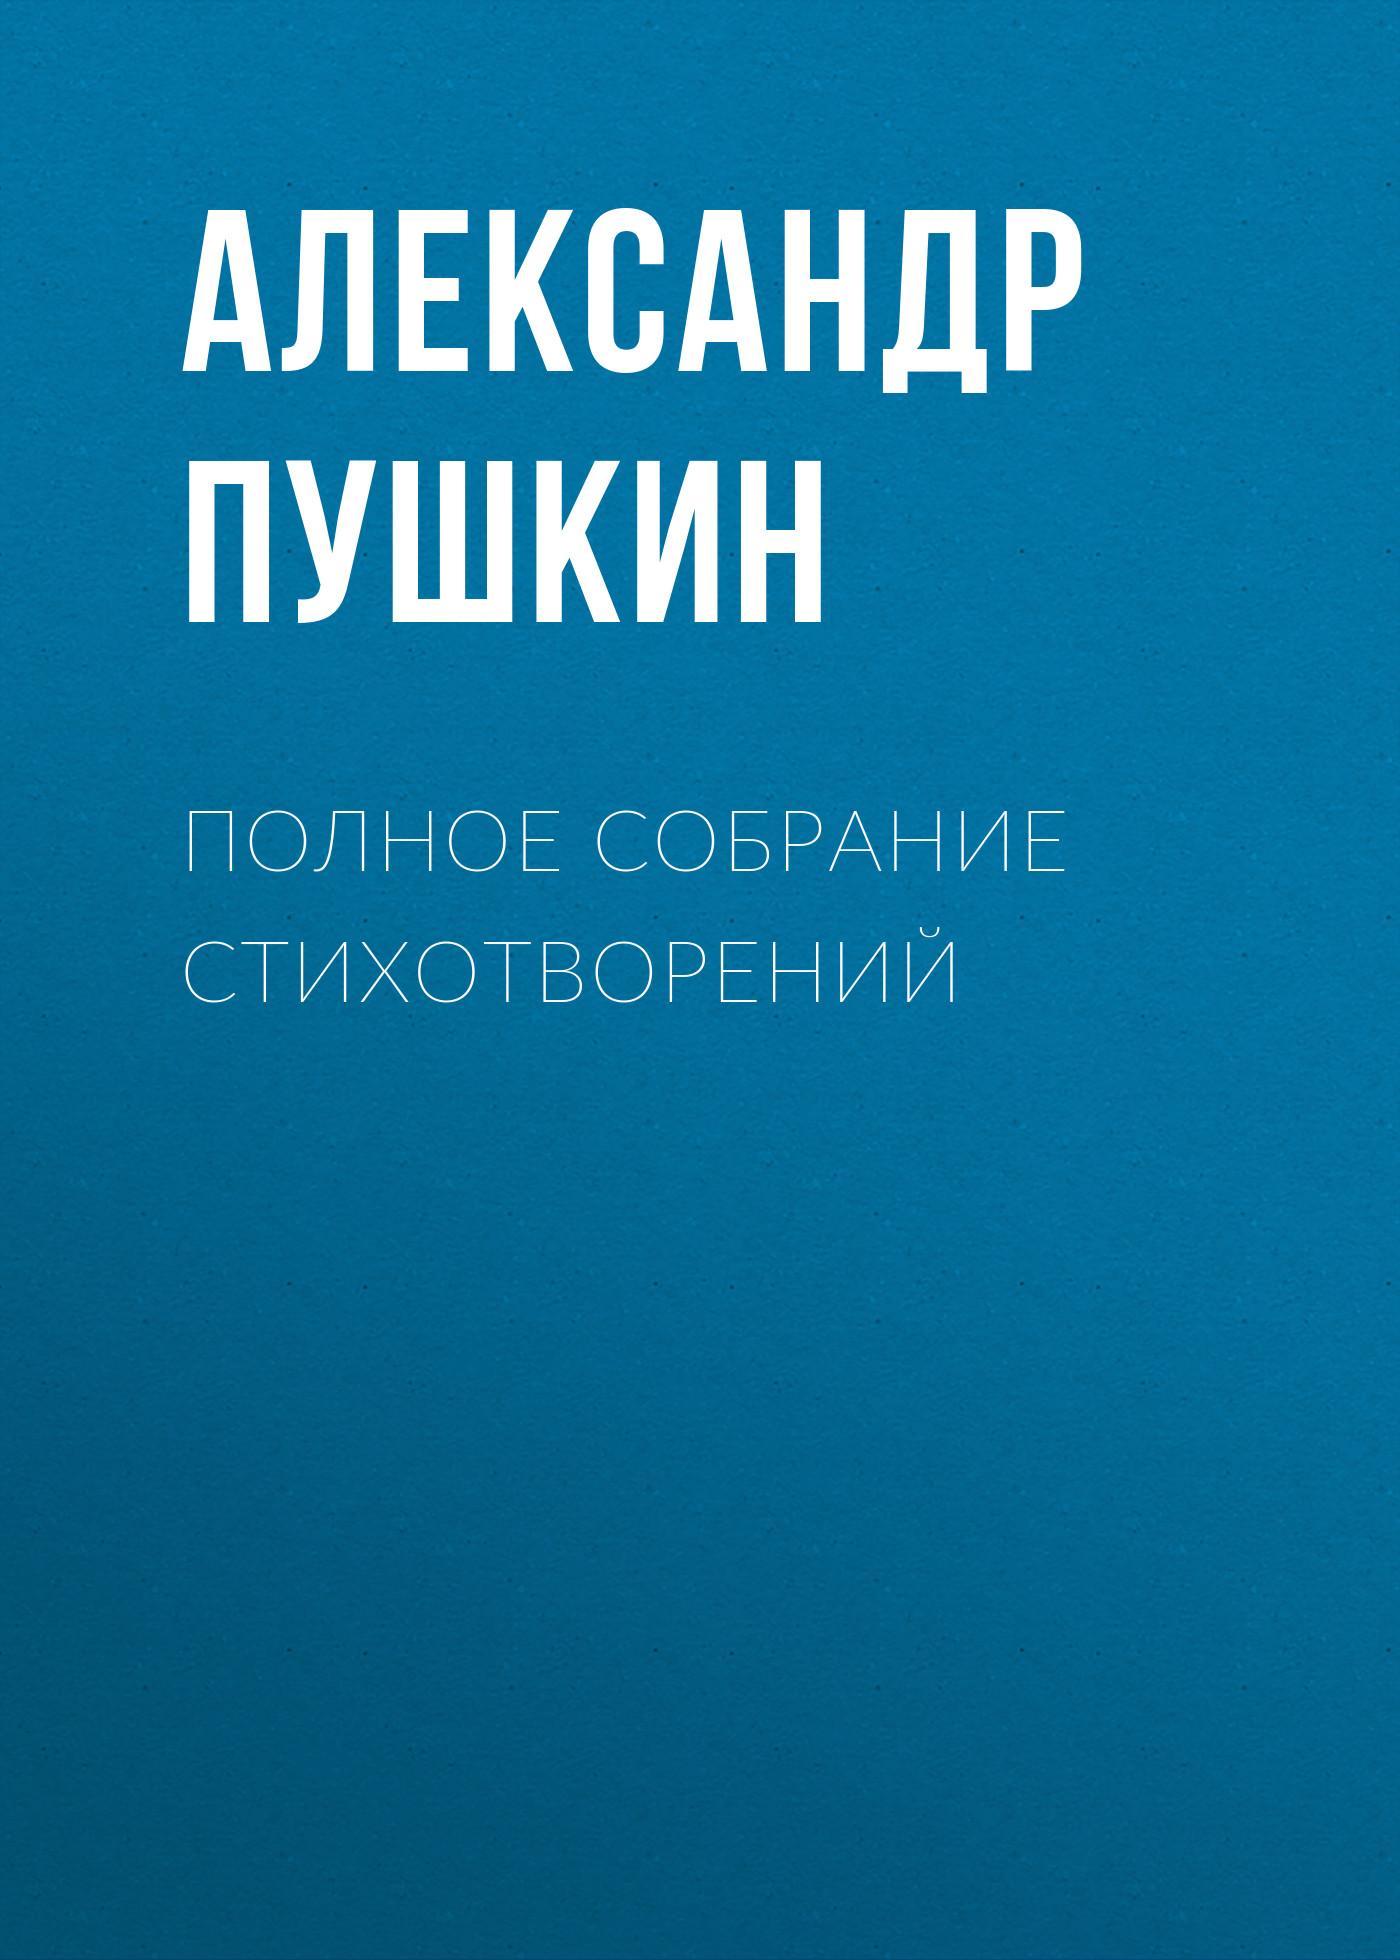 Полное собрание стихотворений ( Александр Пушкин  )